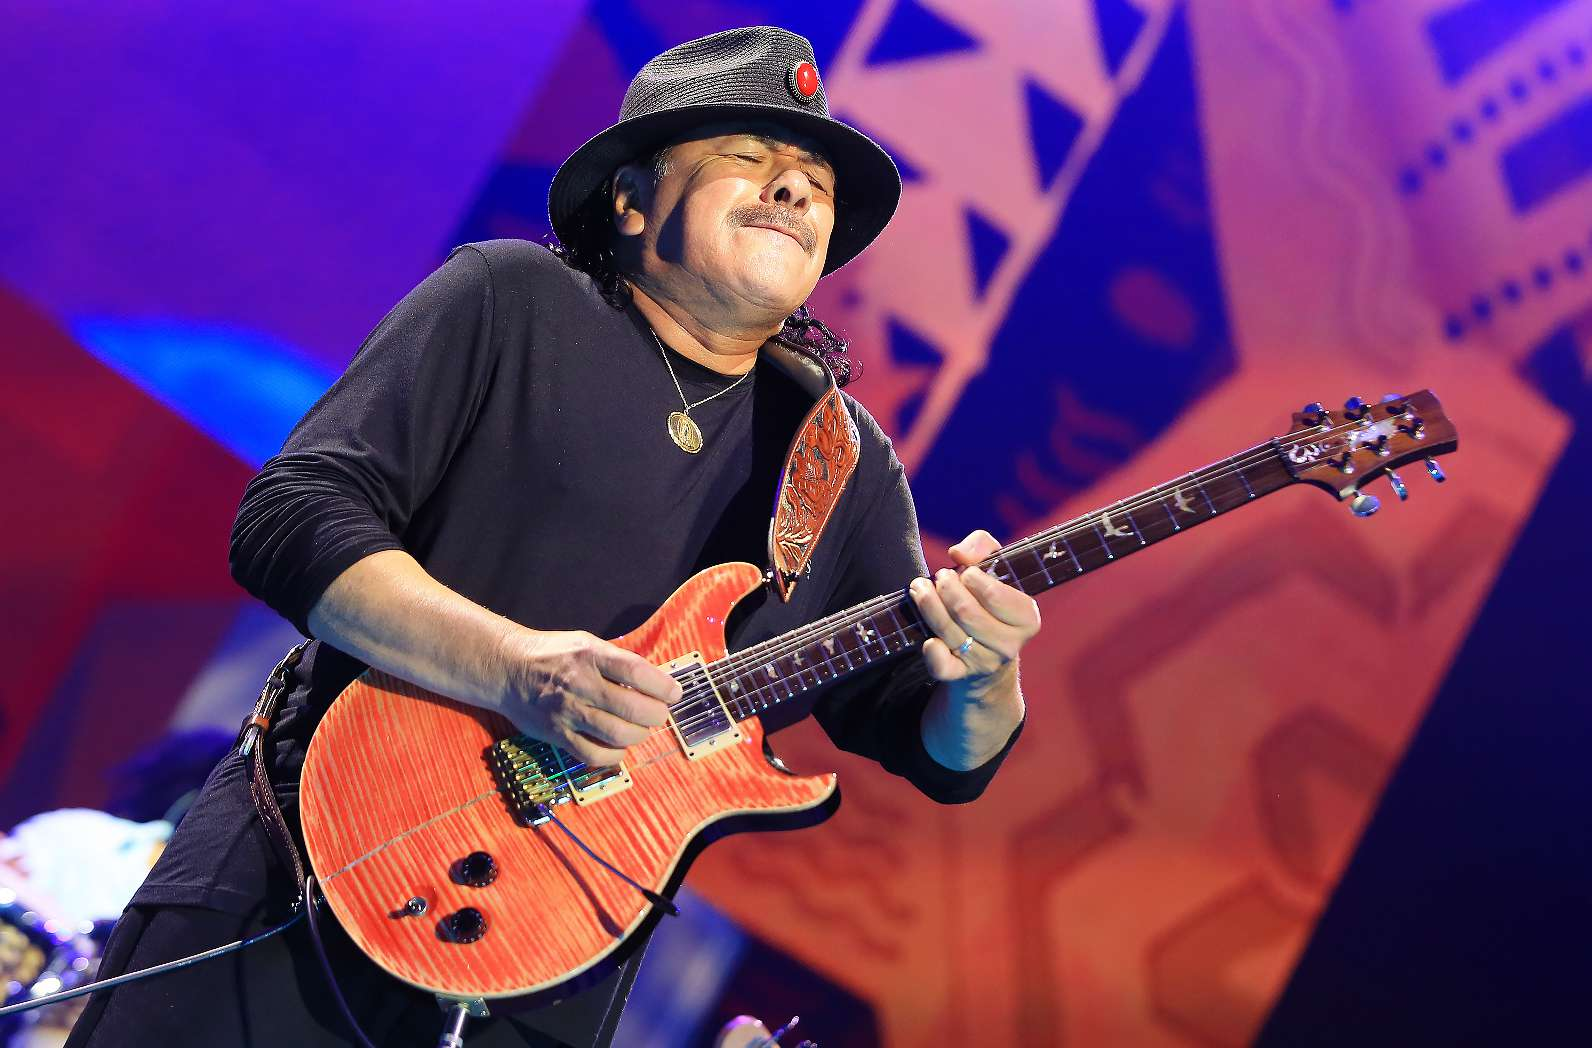 Carlos Santana performing on on August 14, 2014 at the Sprint Center in Kansas City, Missouri